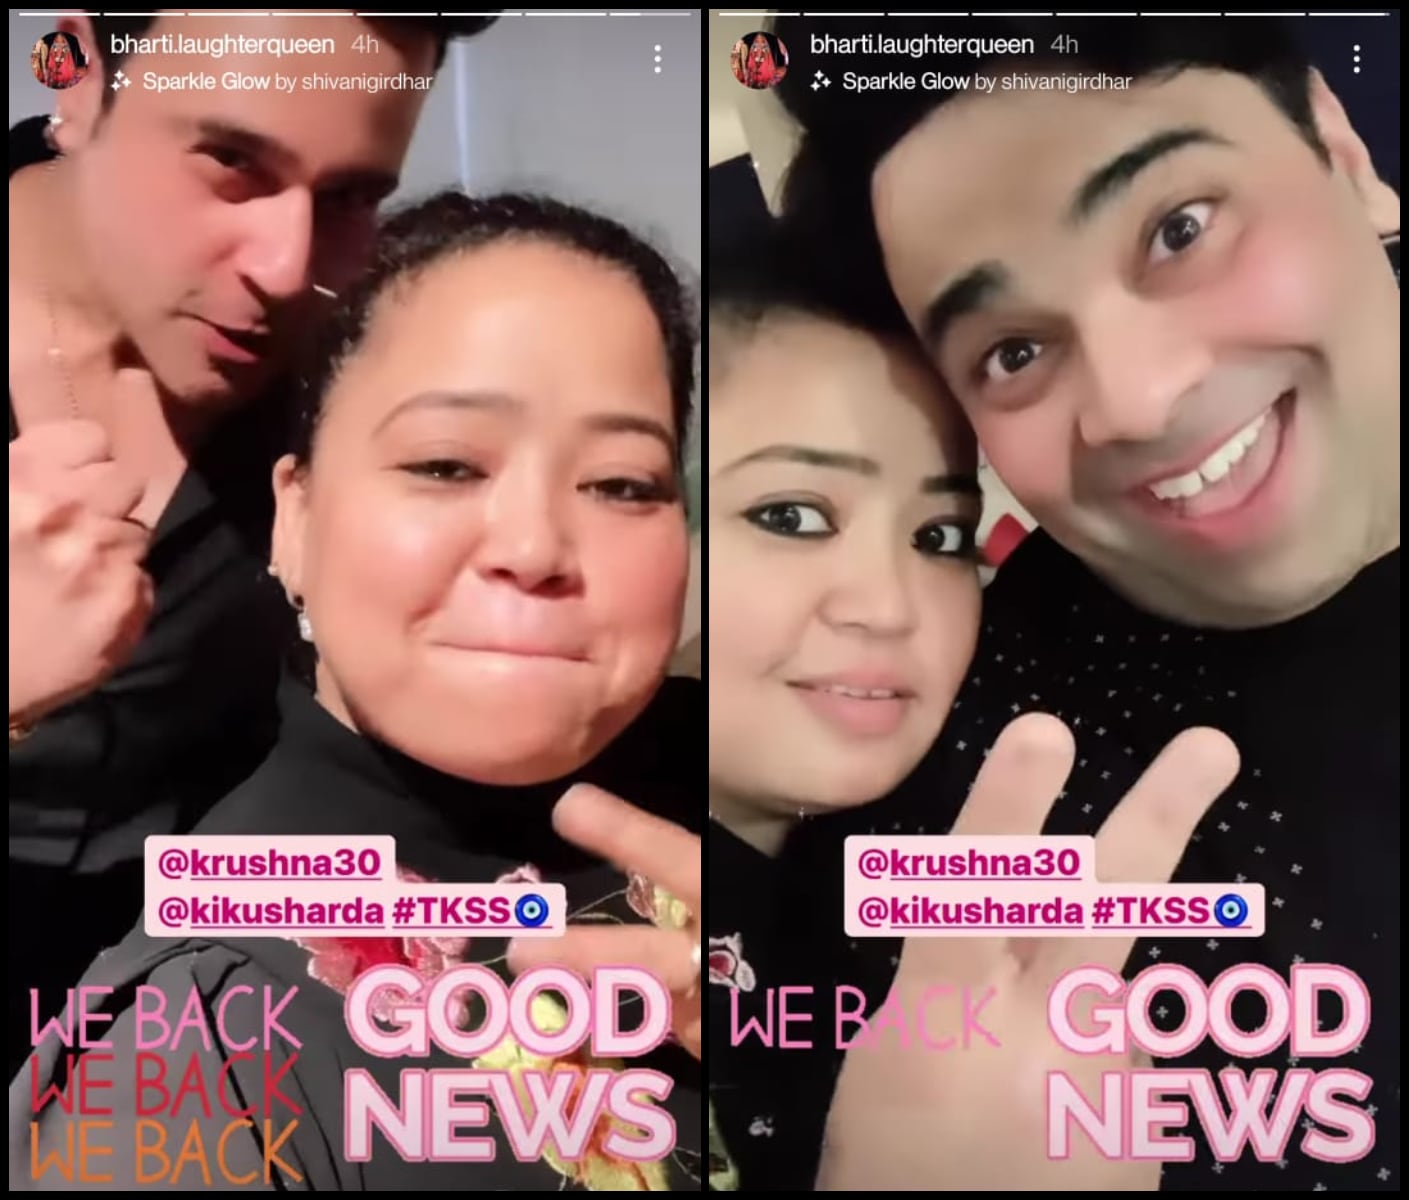 Bharti Singh shared a video with Krushna Abhishek and Kiku Sharda on Instagram Stories.